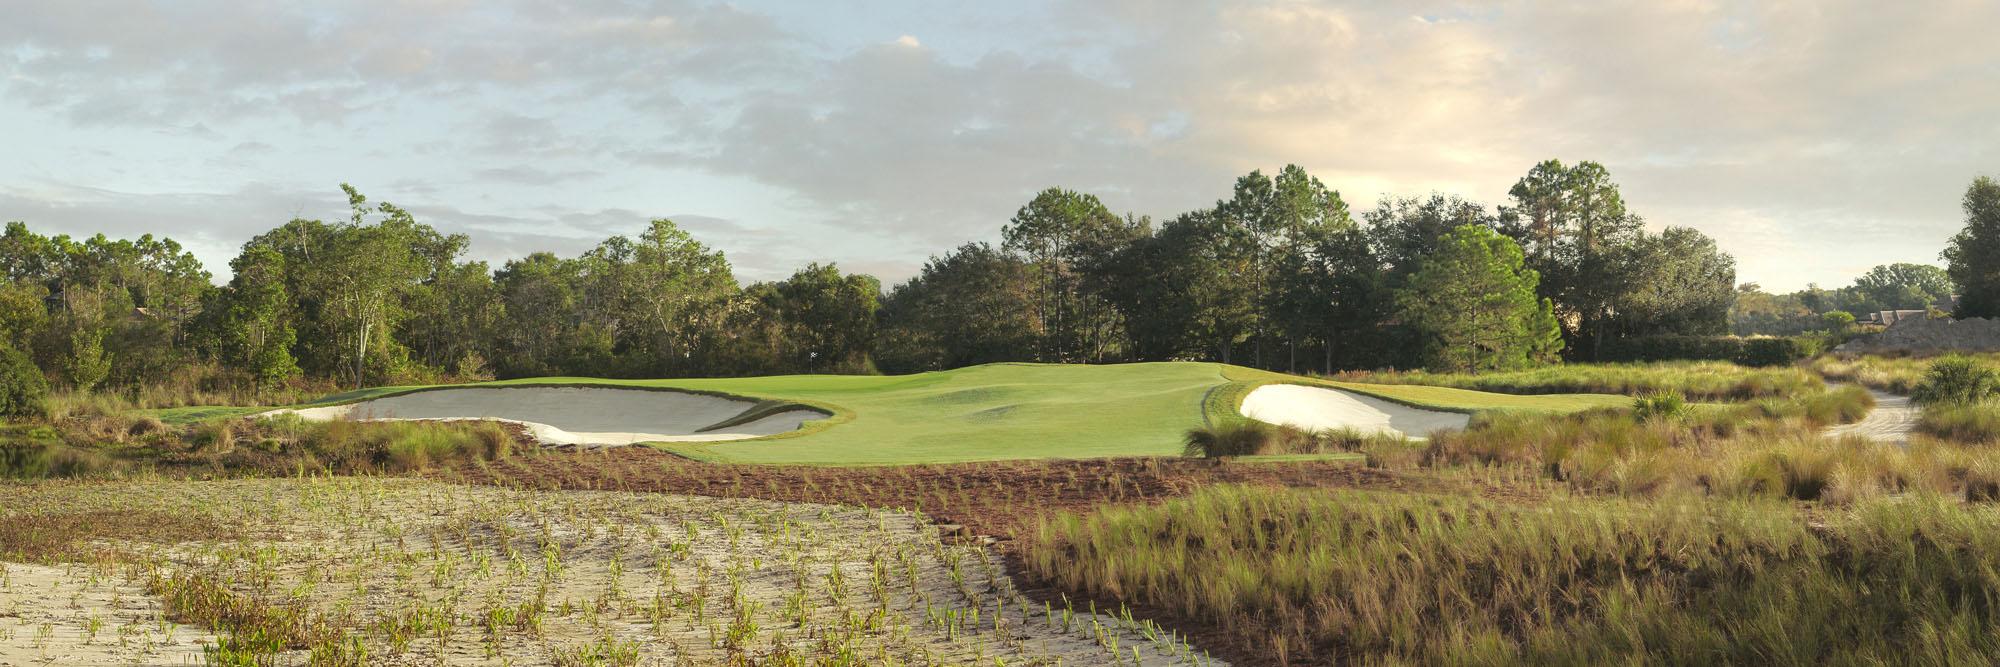 Golf Course Image - Old Memorial Golf Club No. 11